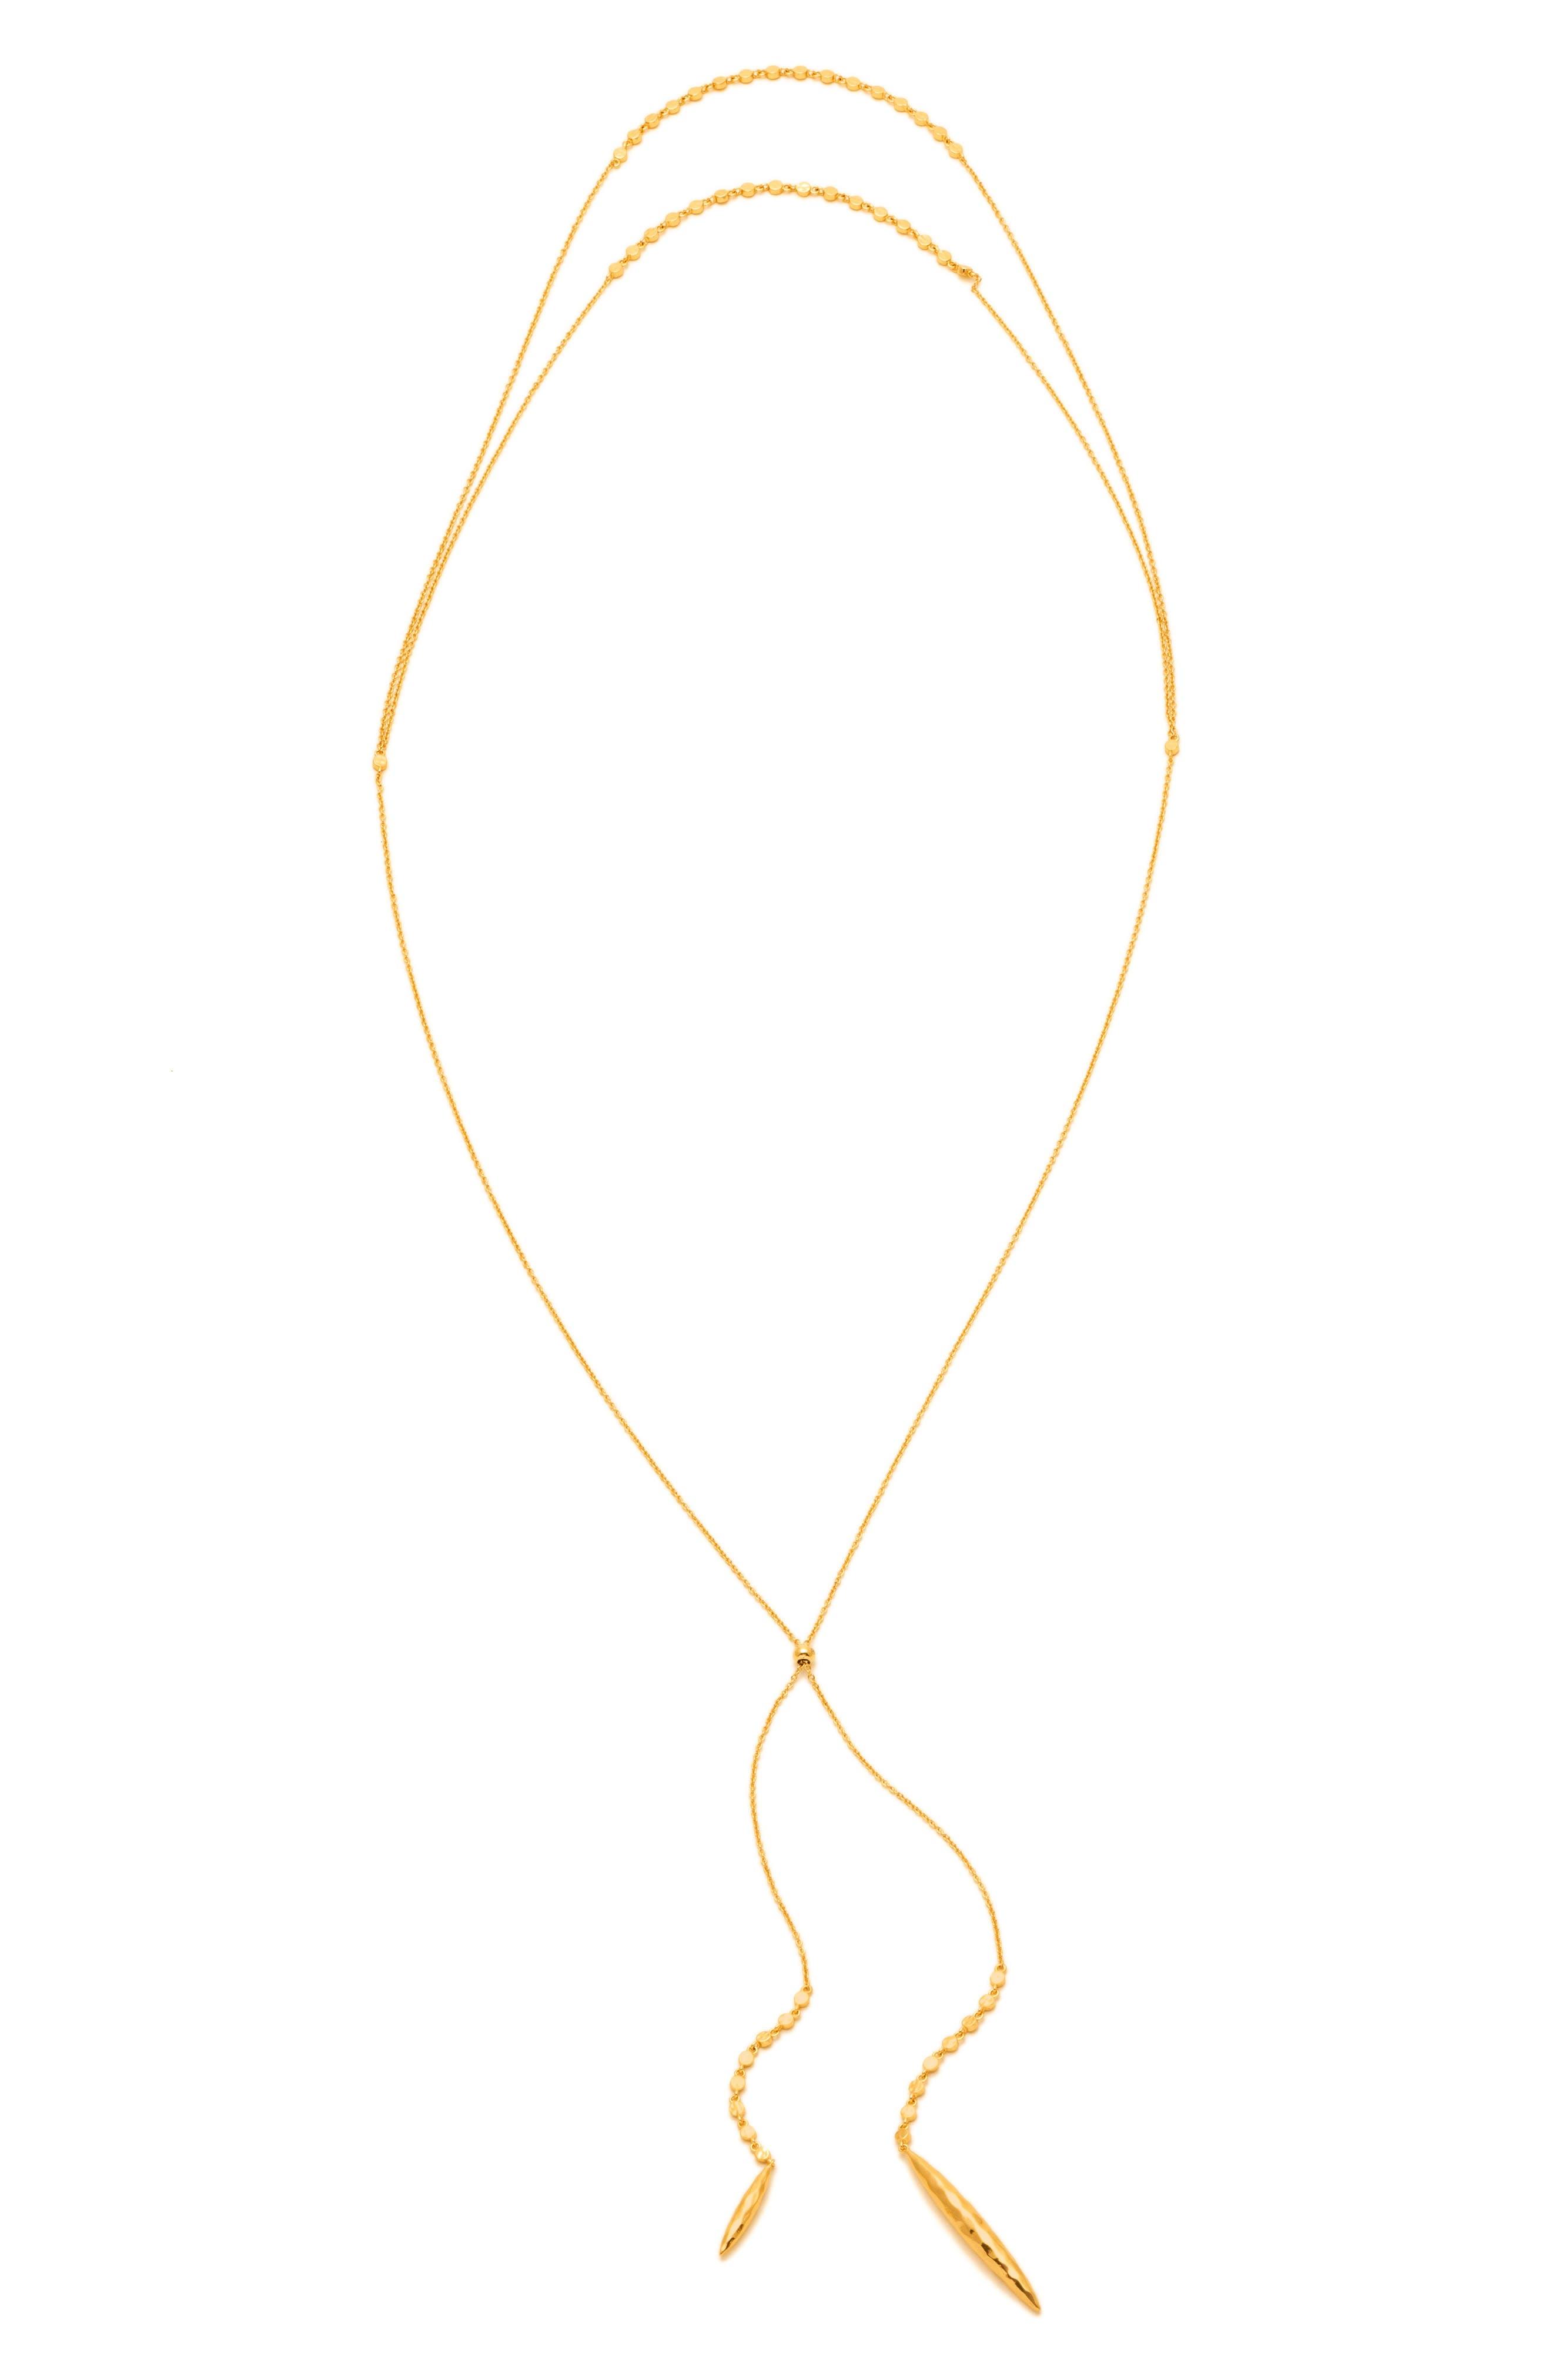 Chloe Multistrand Necklace,                             Alternate thumbnail 2, color,                             Gold